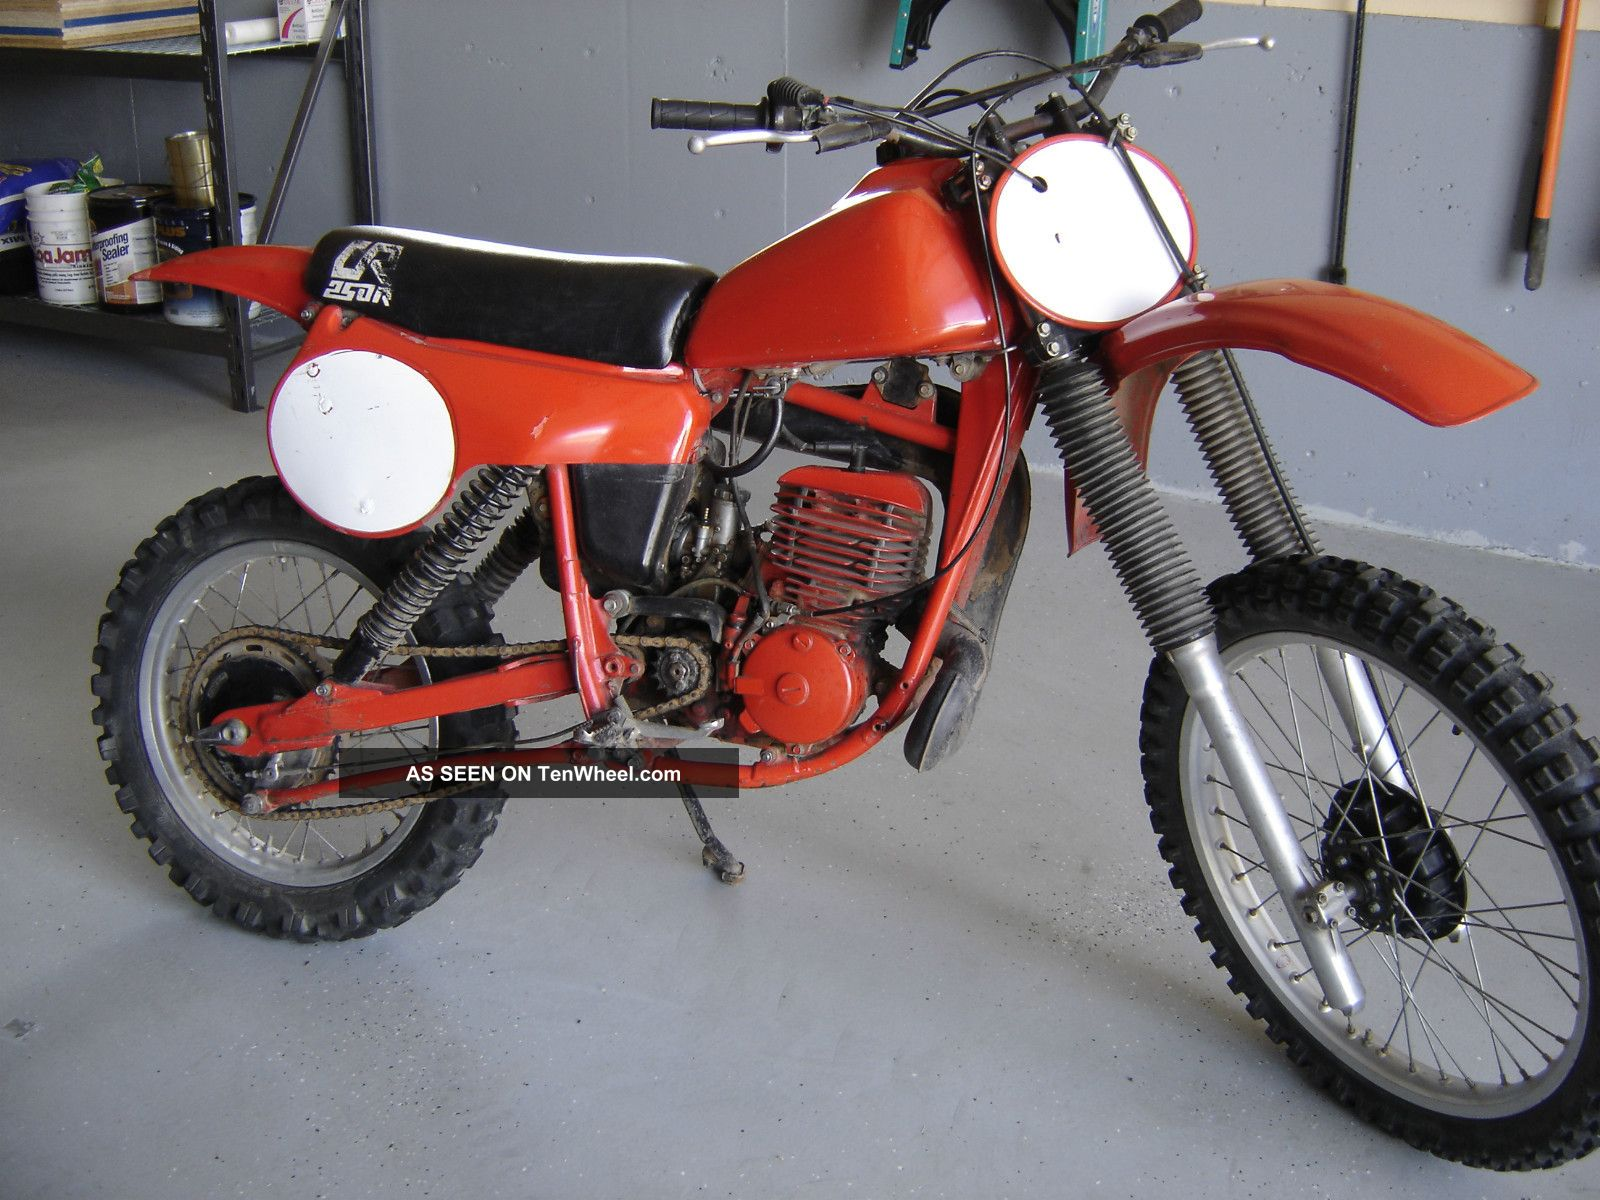 1980 Cr250r Elsinore Red Rocket Ahrma Vintage Motocross CR photo